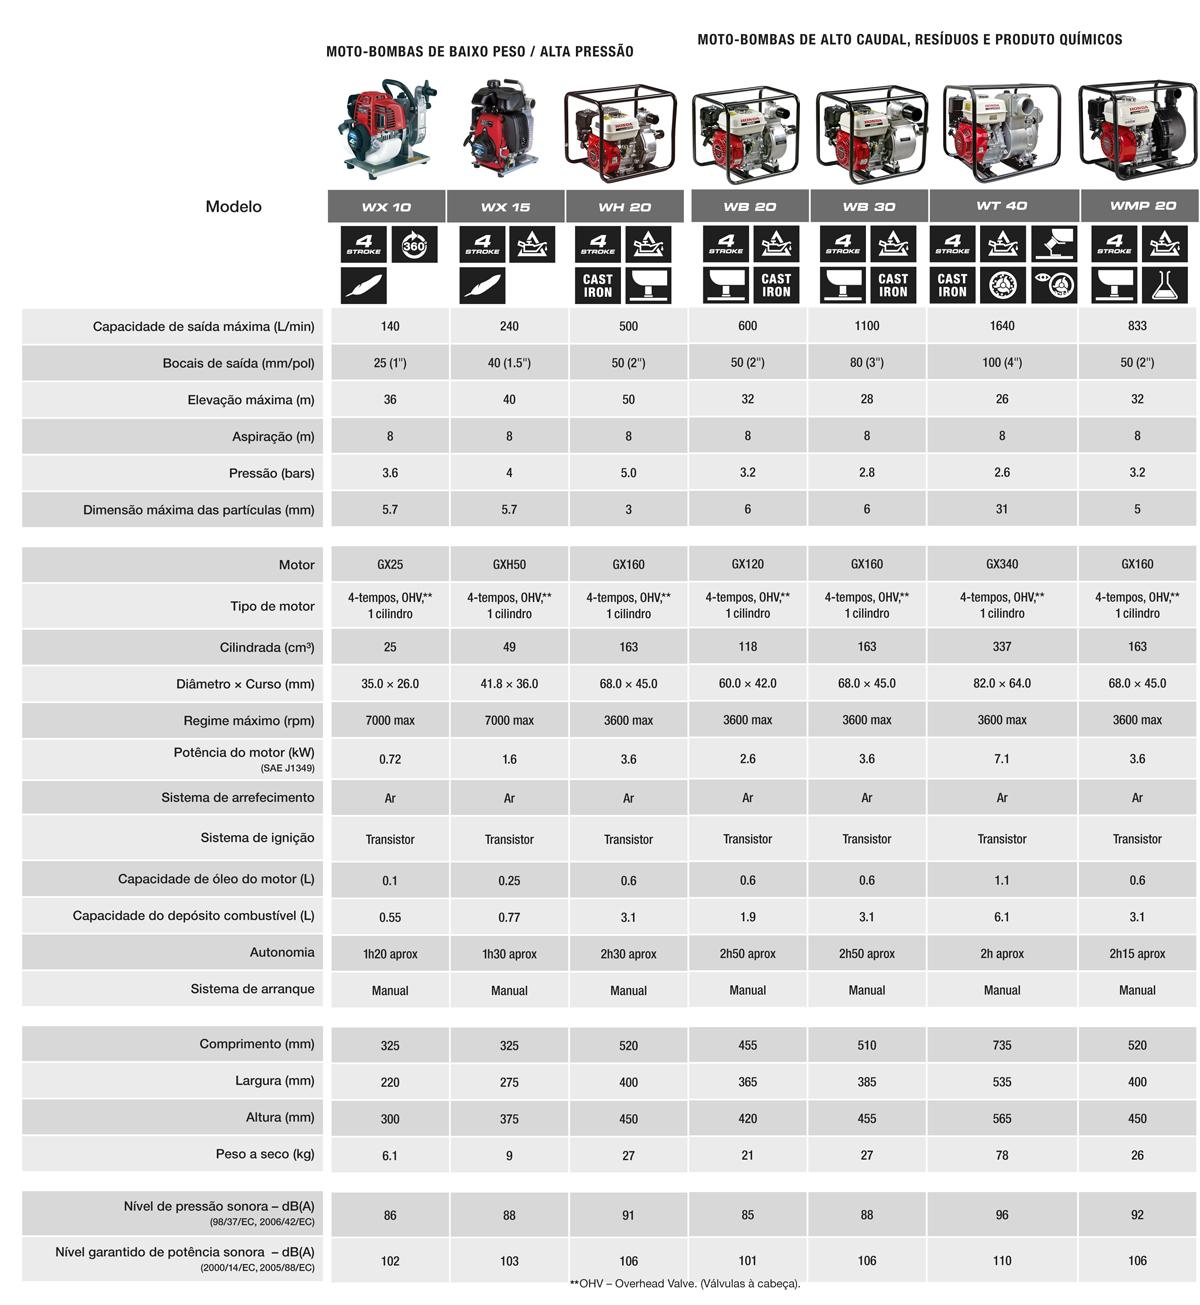 motobombas-honda-caracteristicas